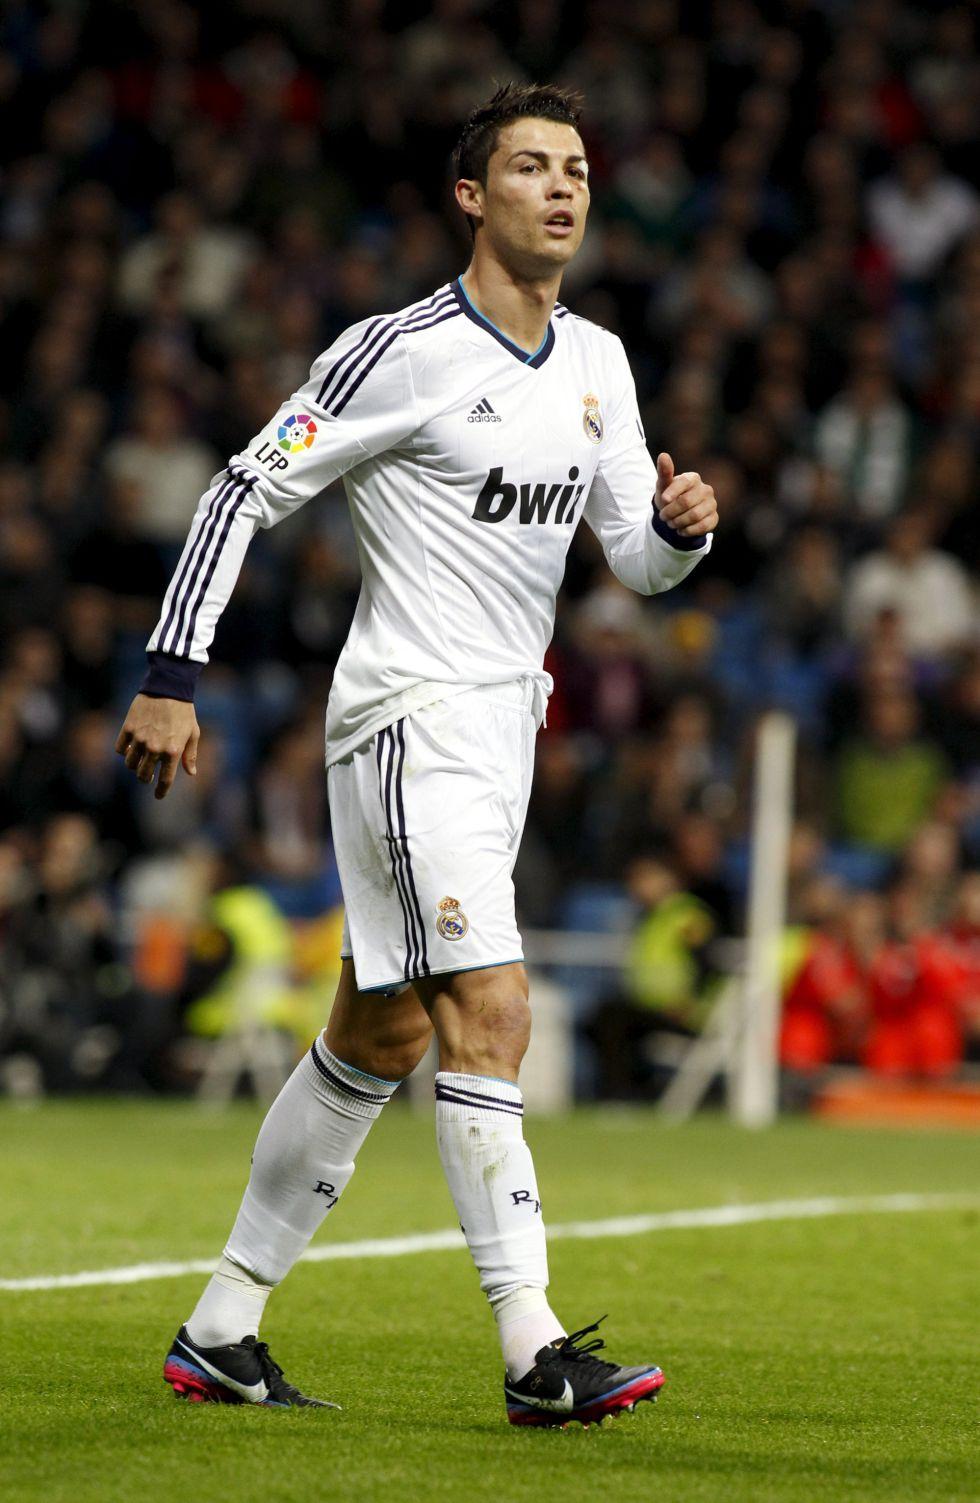 La afición del Manchester City abuchea a Cristiano Ronaldo